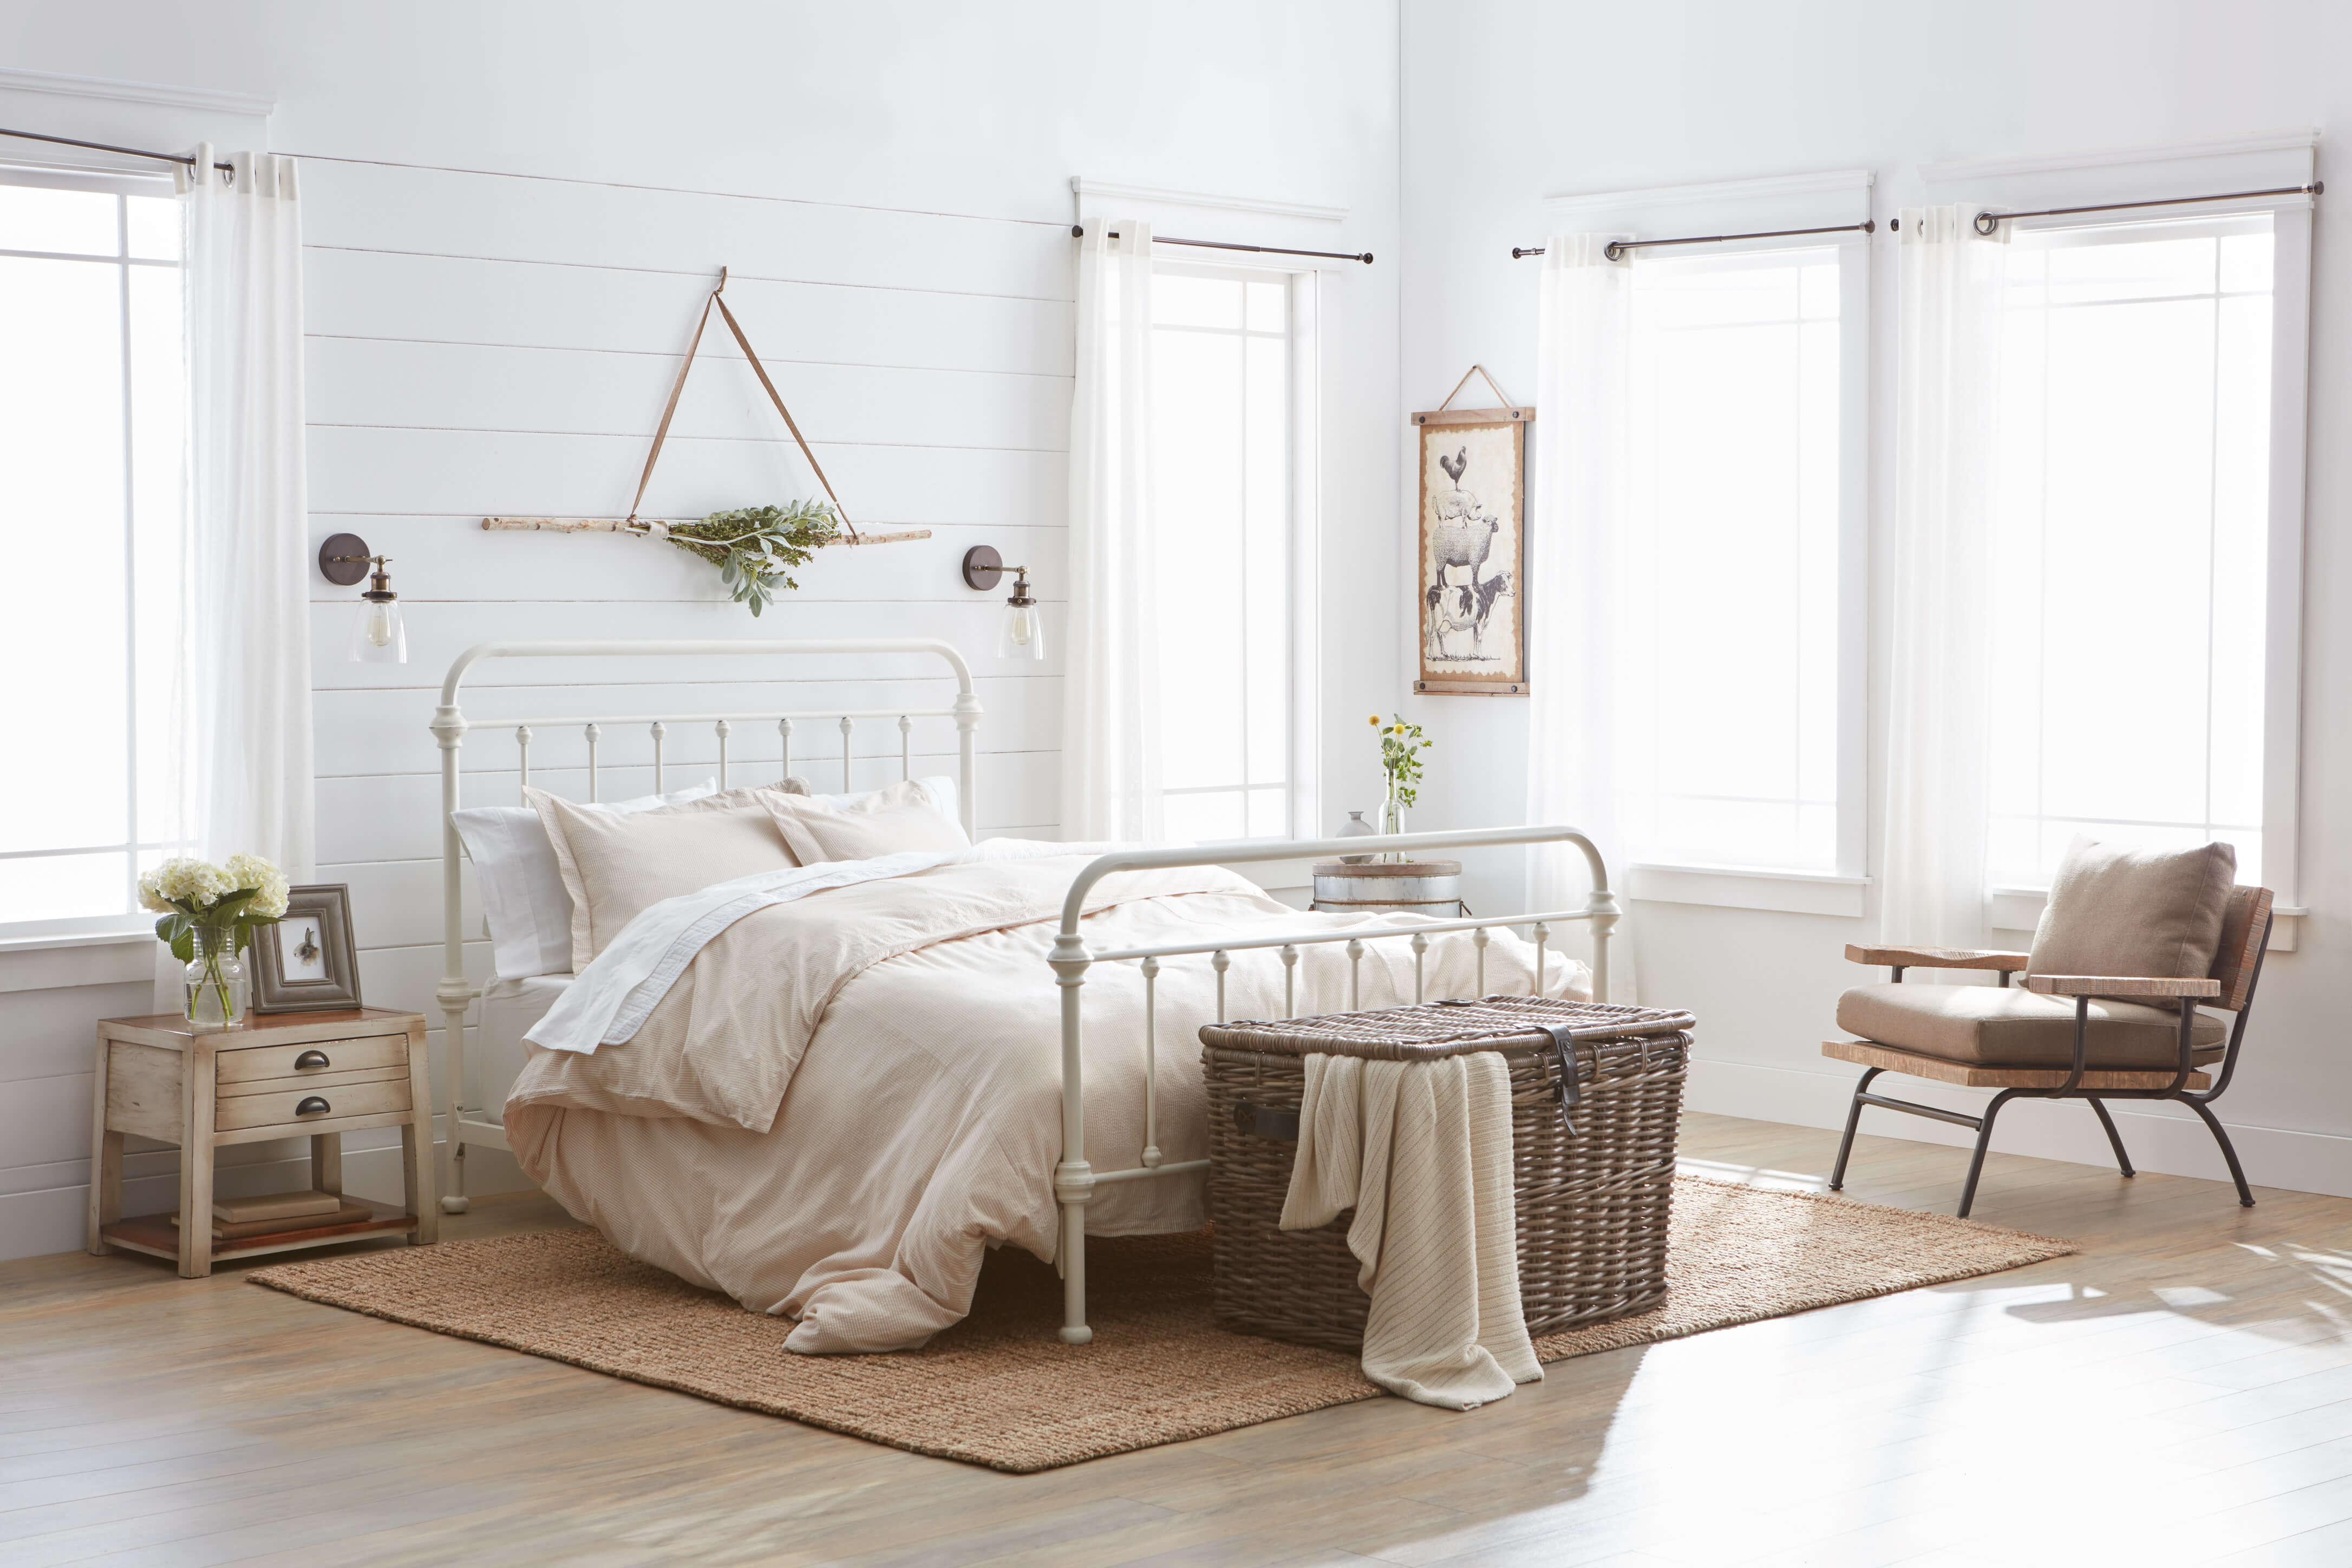 Charming Farmhouse Decorating Ideas